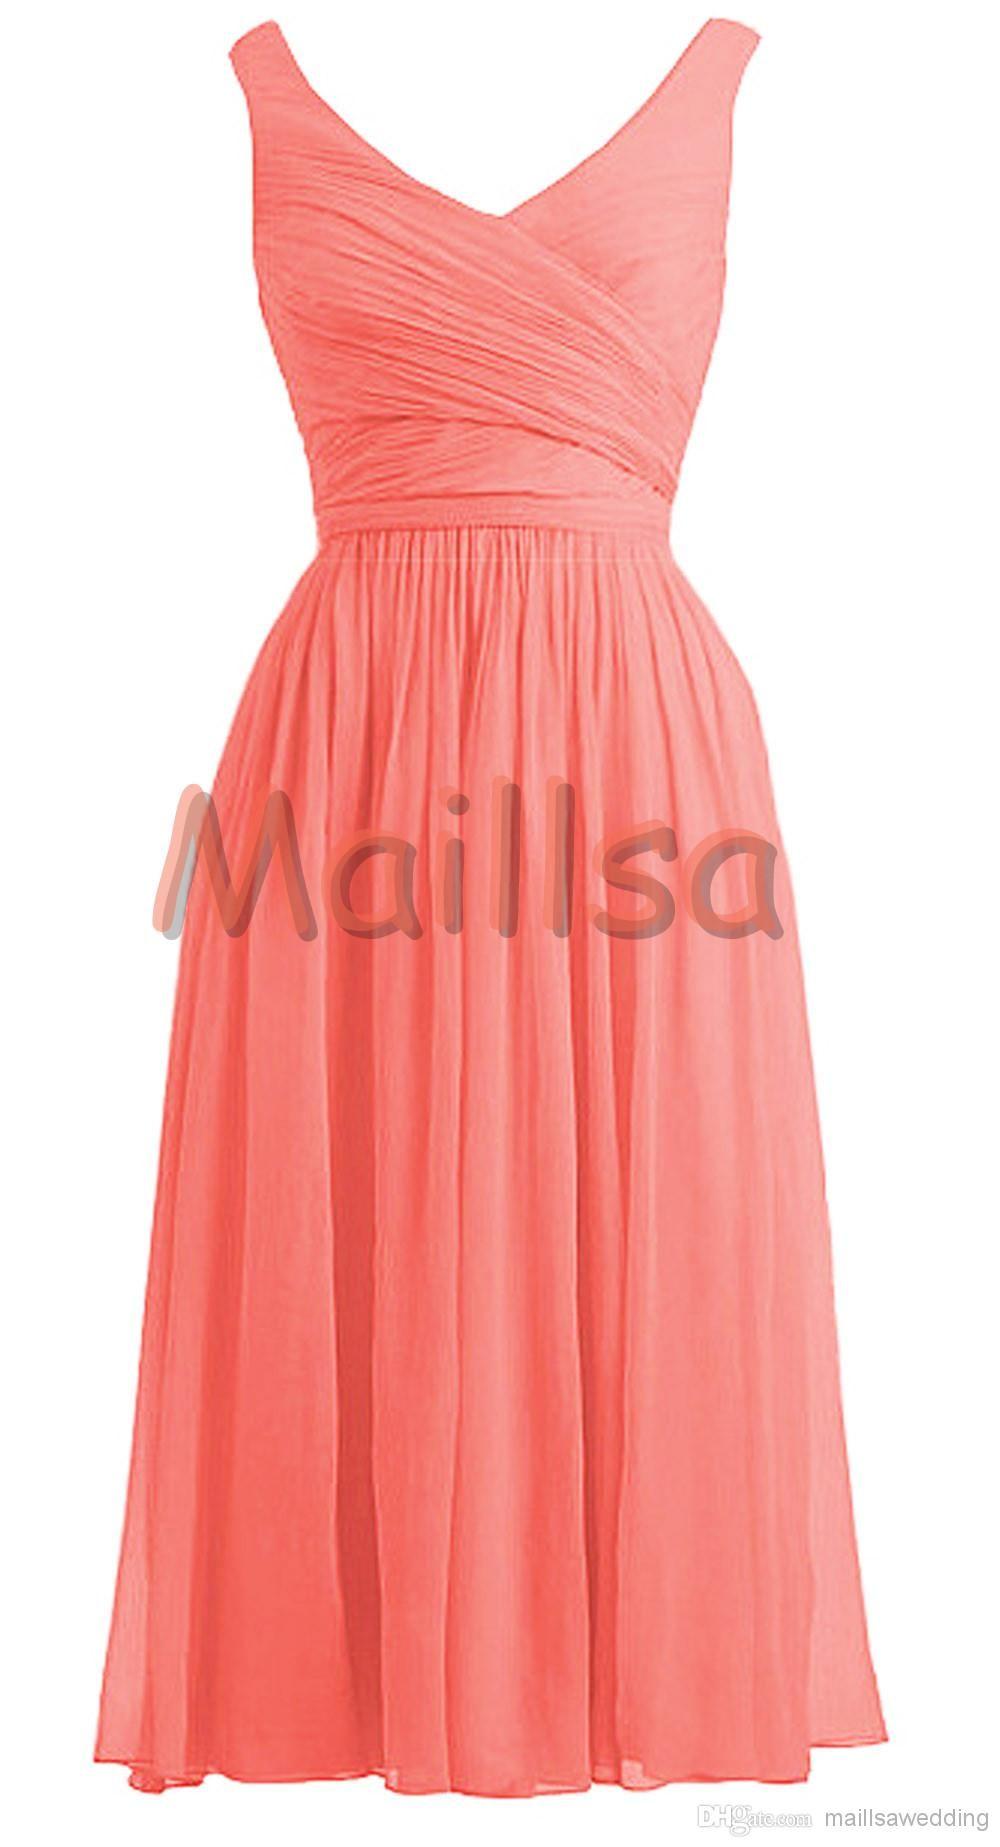 Wholesale Bridesmaid Dress - Buy Maillsa 2014 Chiffon V-Neck Elegant Prom Dresses Tea Length Bridesmaid Dresses, $51.3 | DHgate.com